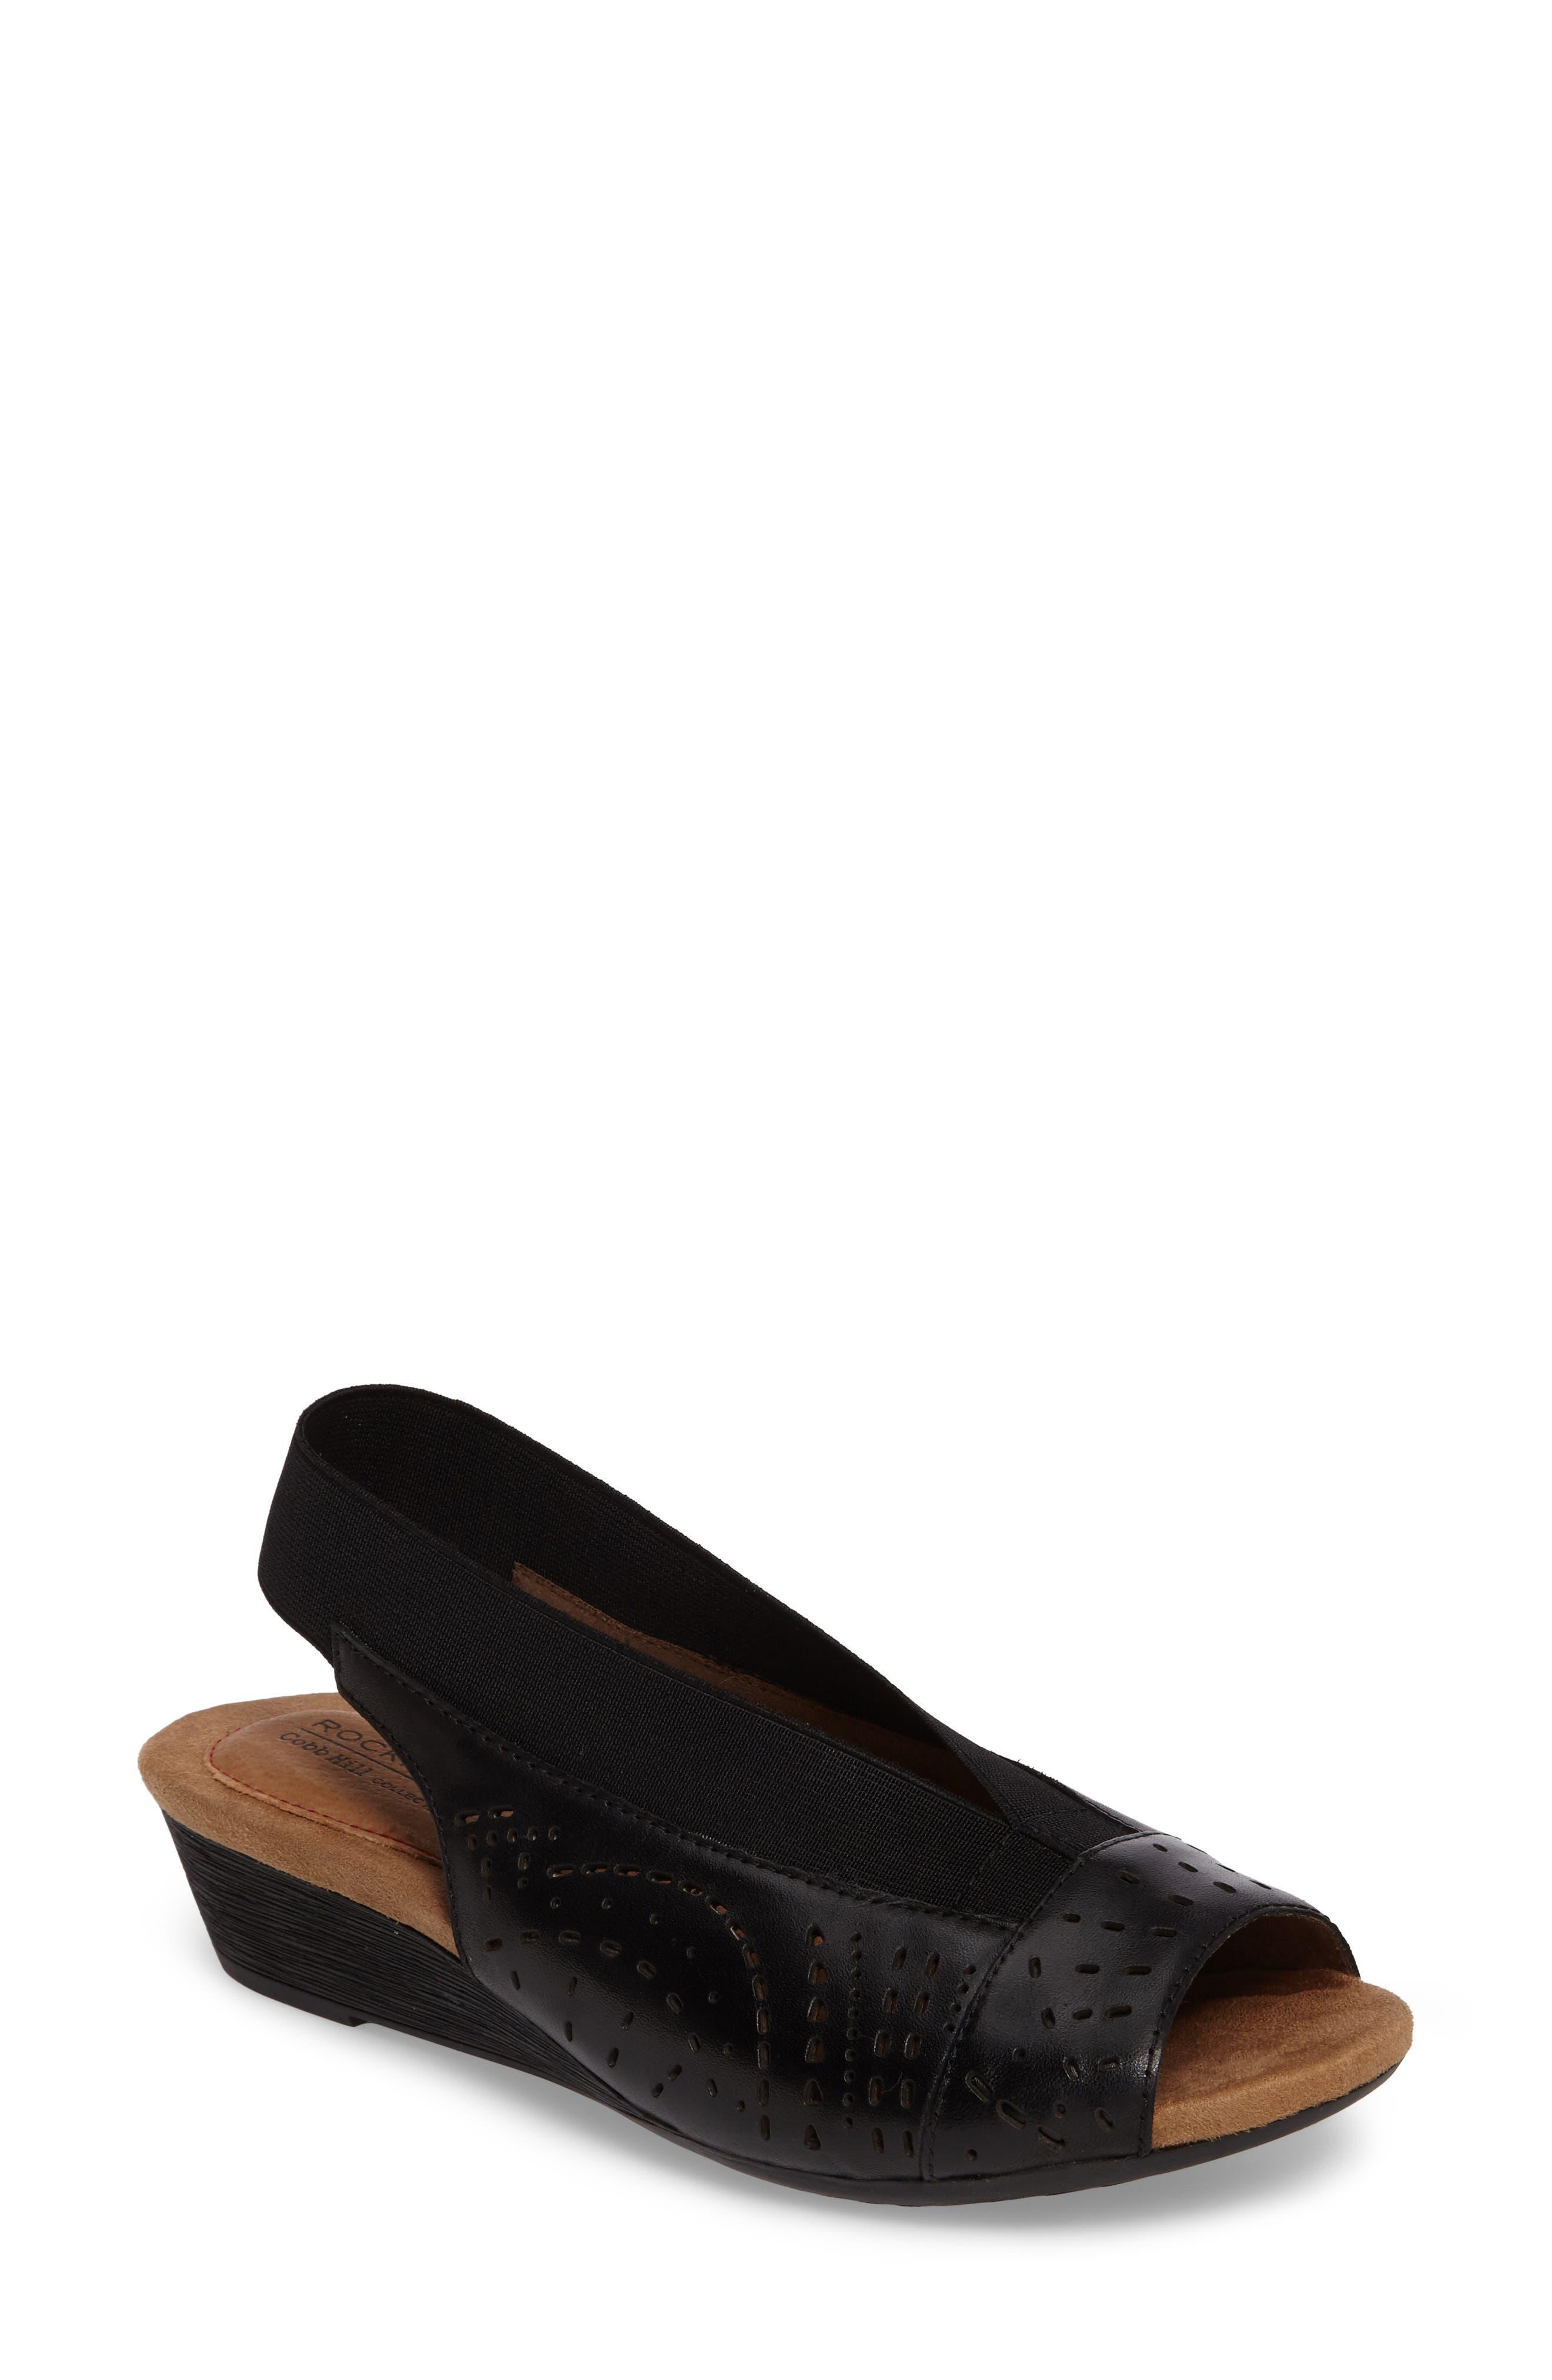 Judson Slingback Wedge Sandal,                             Main thumbnail 1, color,                             BLACK LEATHER